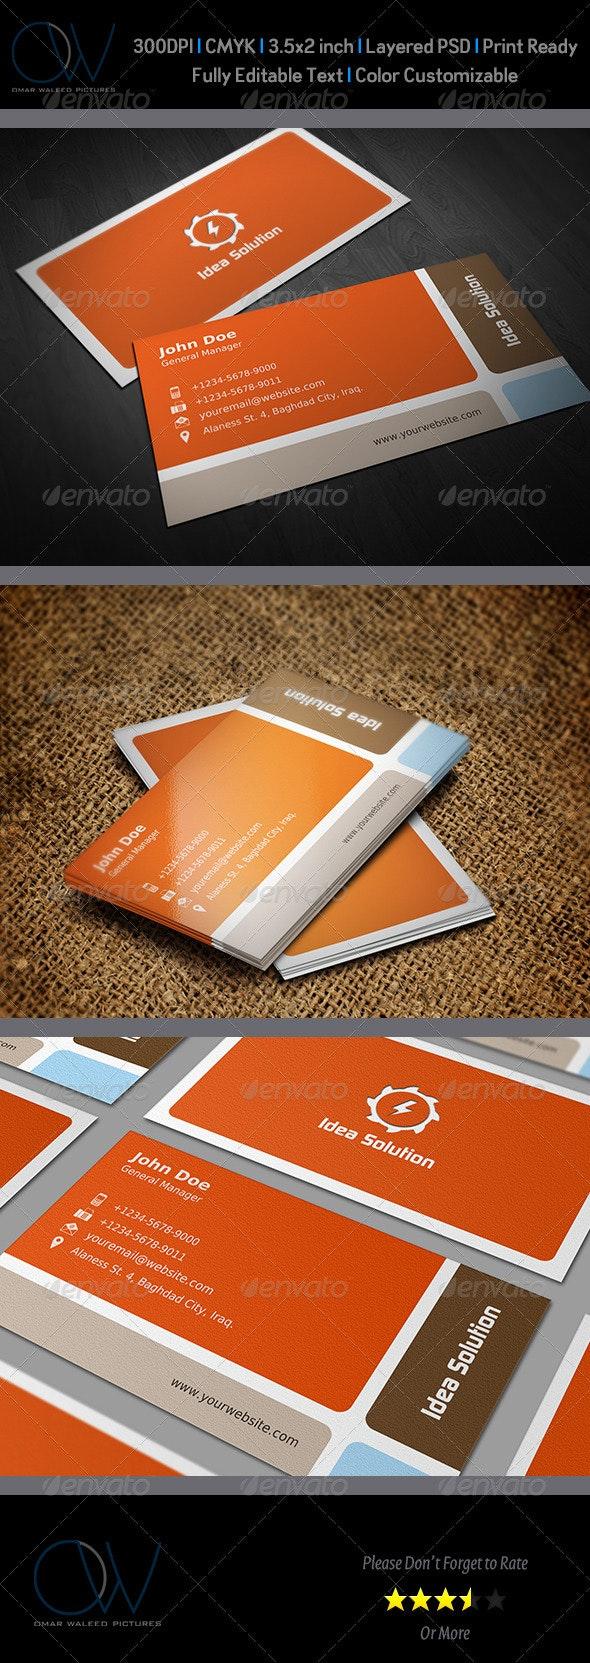 Corporate Business Card Vol.7 - Corporate Business Cards